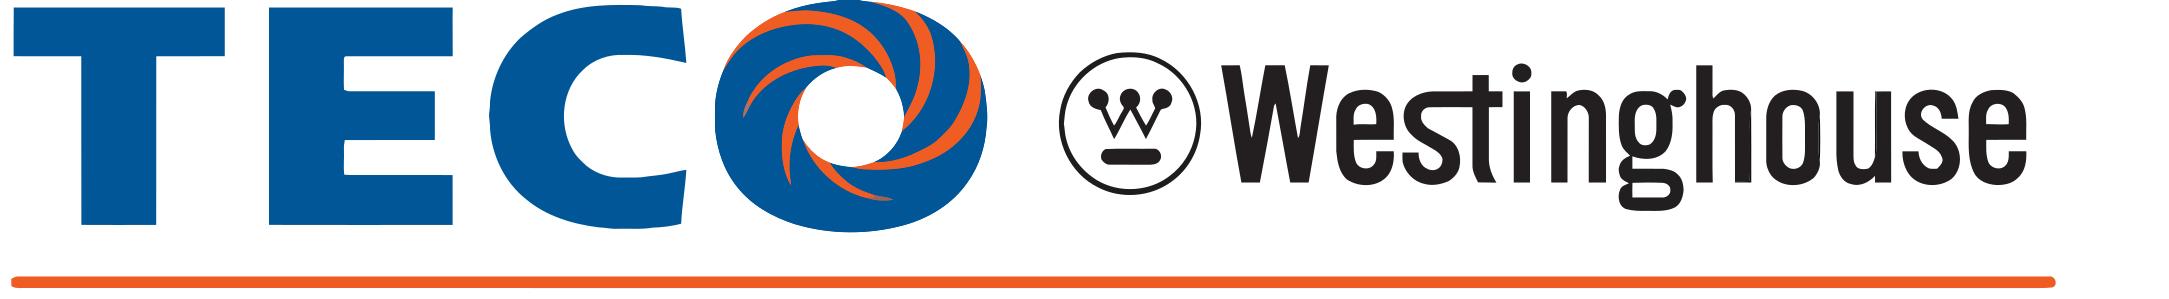 Teco - Westinghouse logo